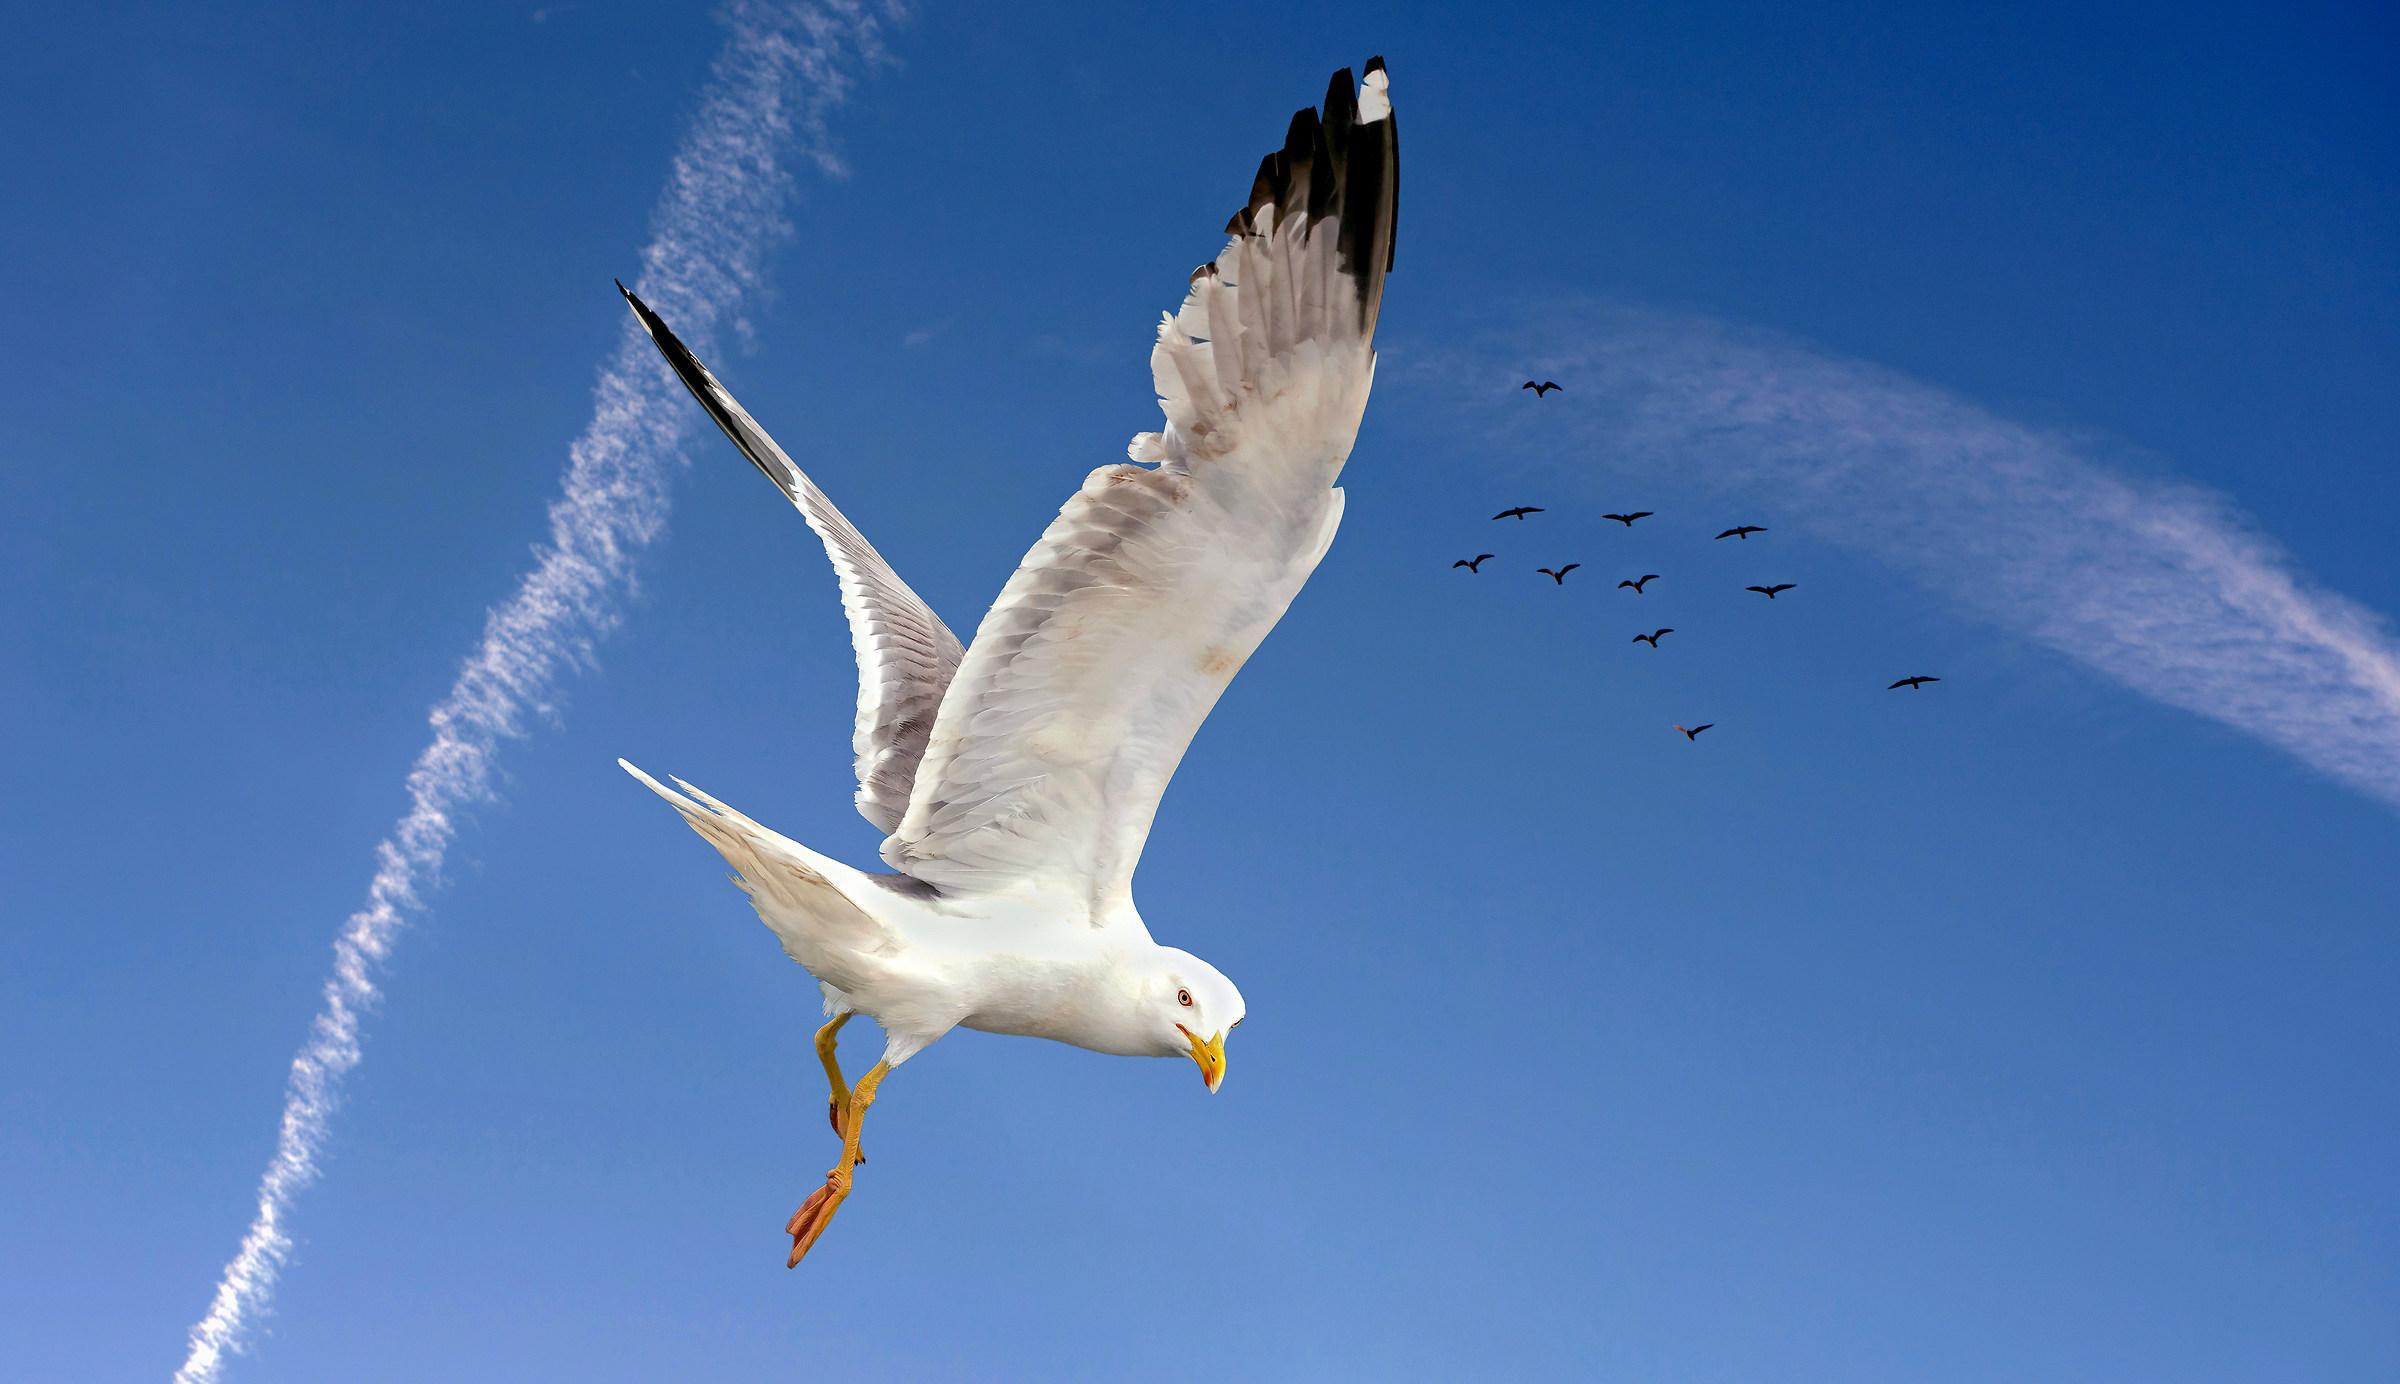 Seagull (25% of the original photo)...